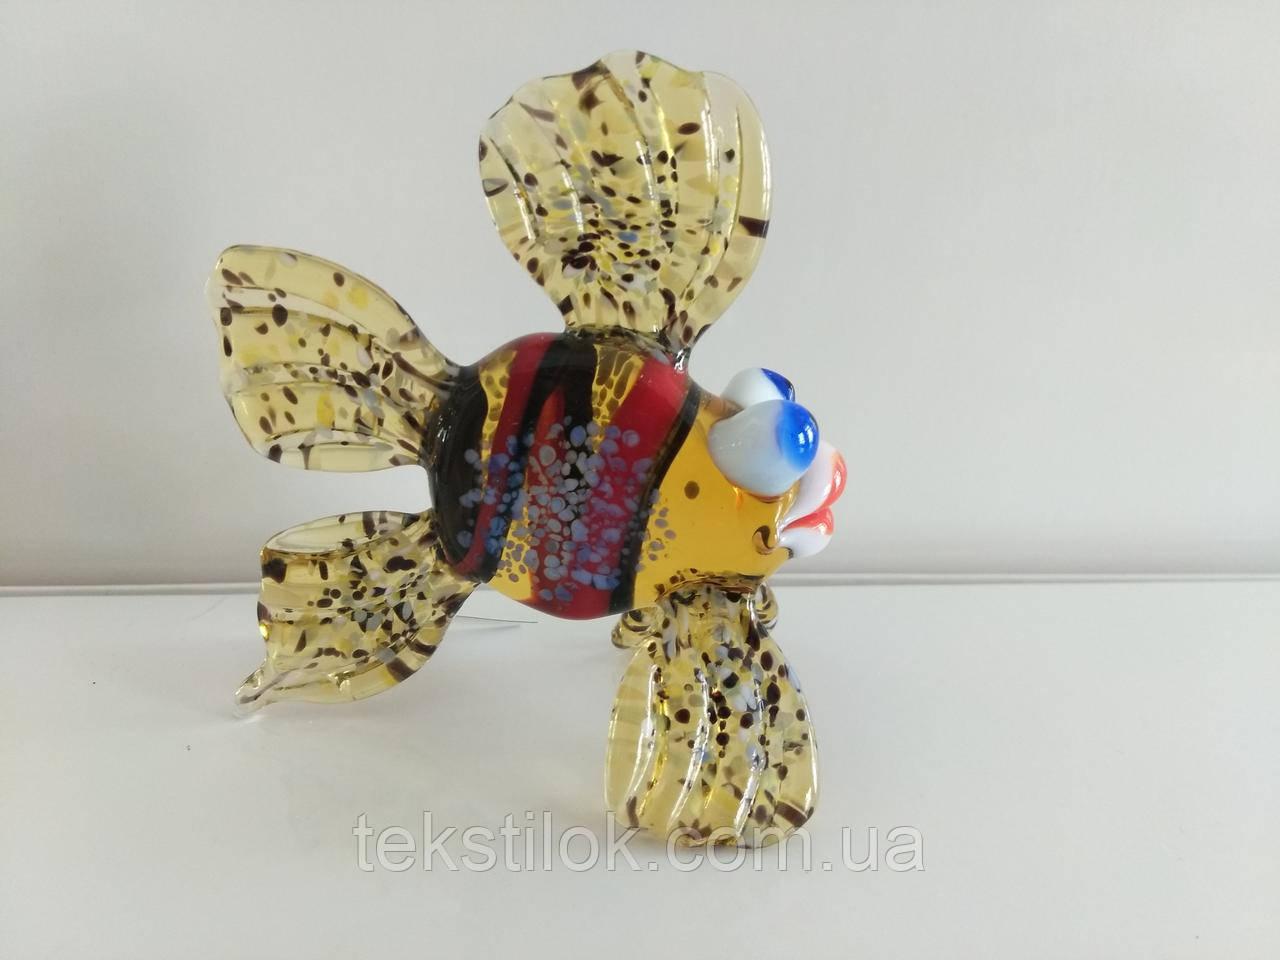 Фигурка стекло Рыбка янтарная